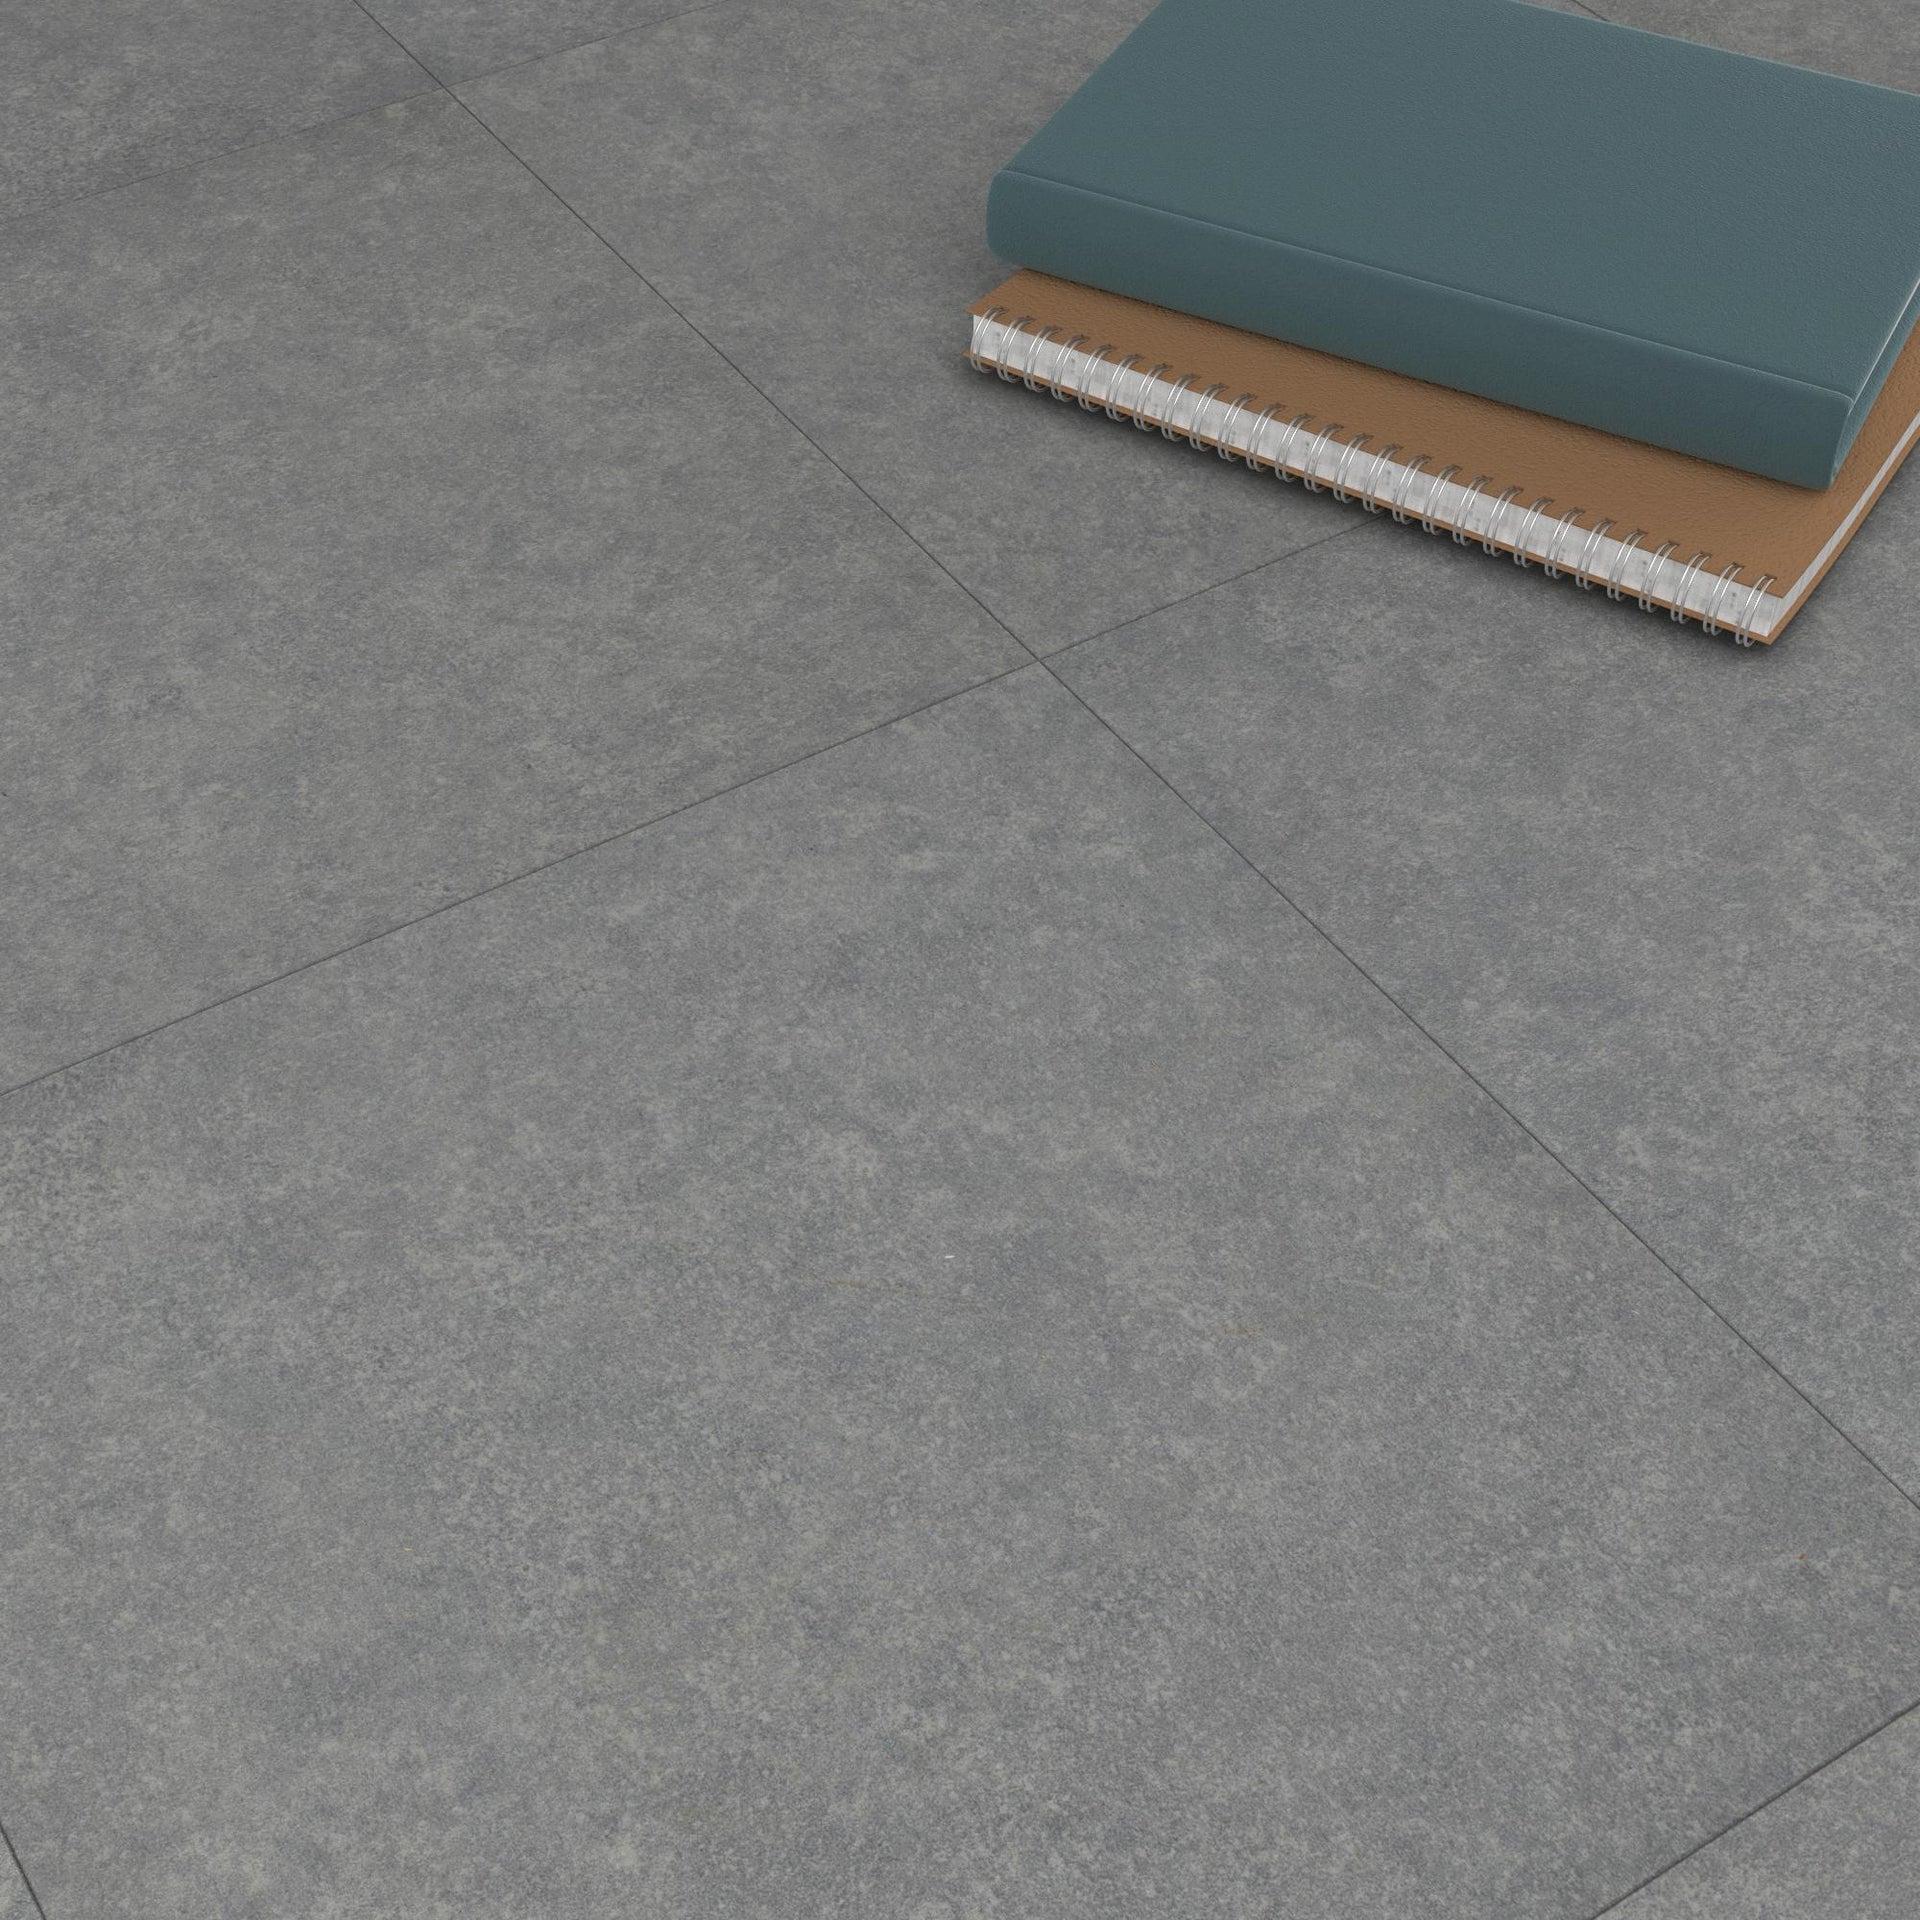 Pavimento PVC adesivo Kamet Sp 1.2 mm grigio / argento - 4